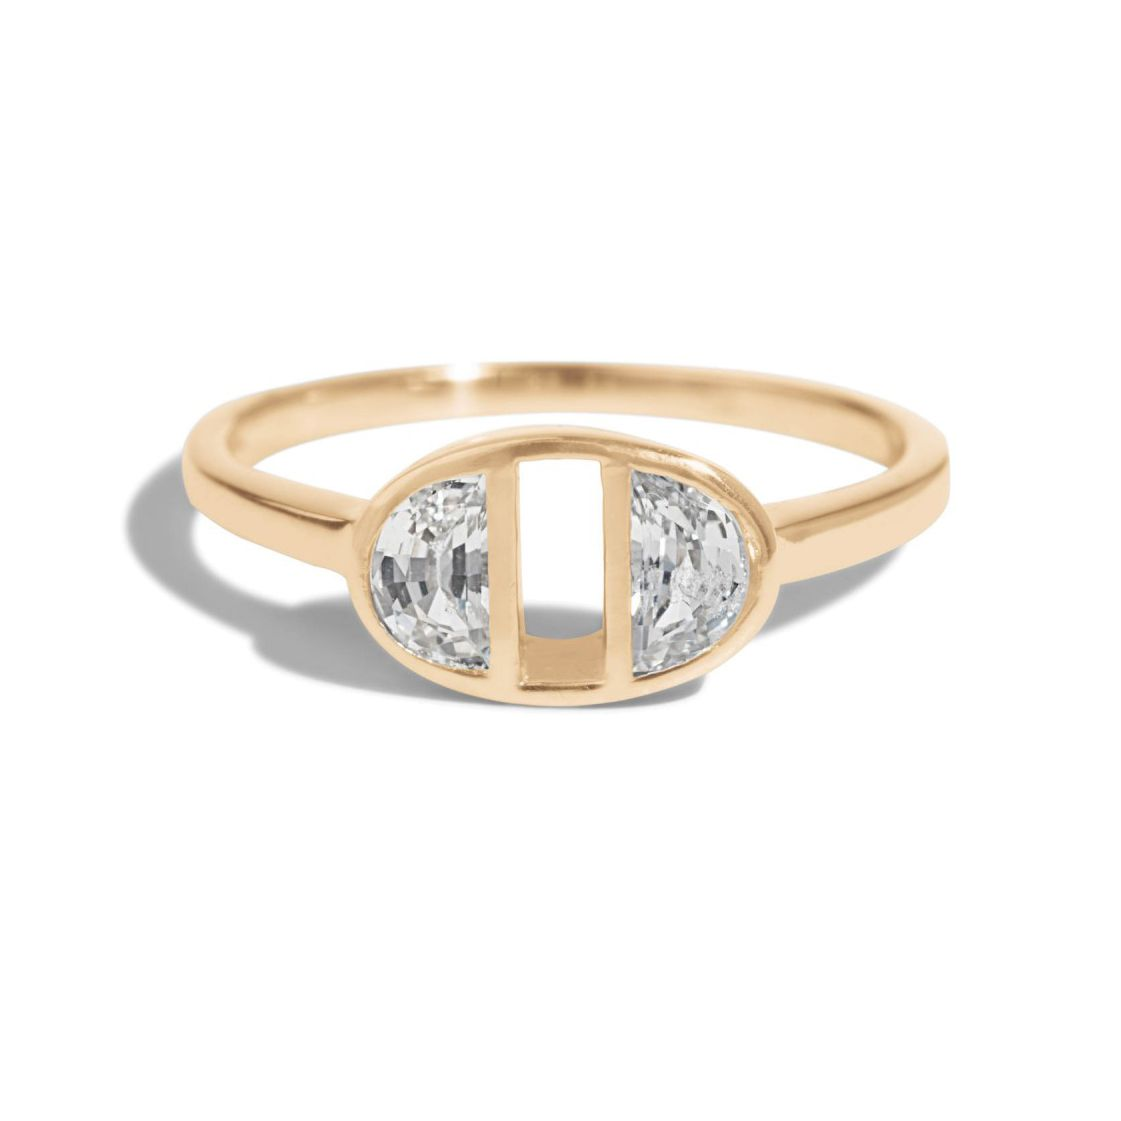 Bario Neal Half-Moon Dyad White Sapphire Ring